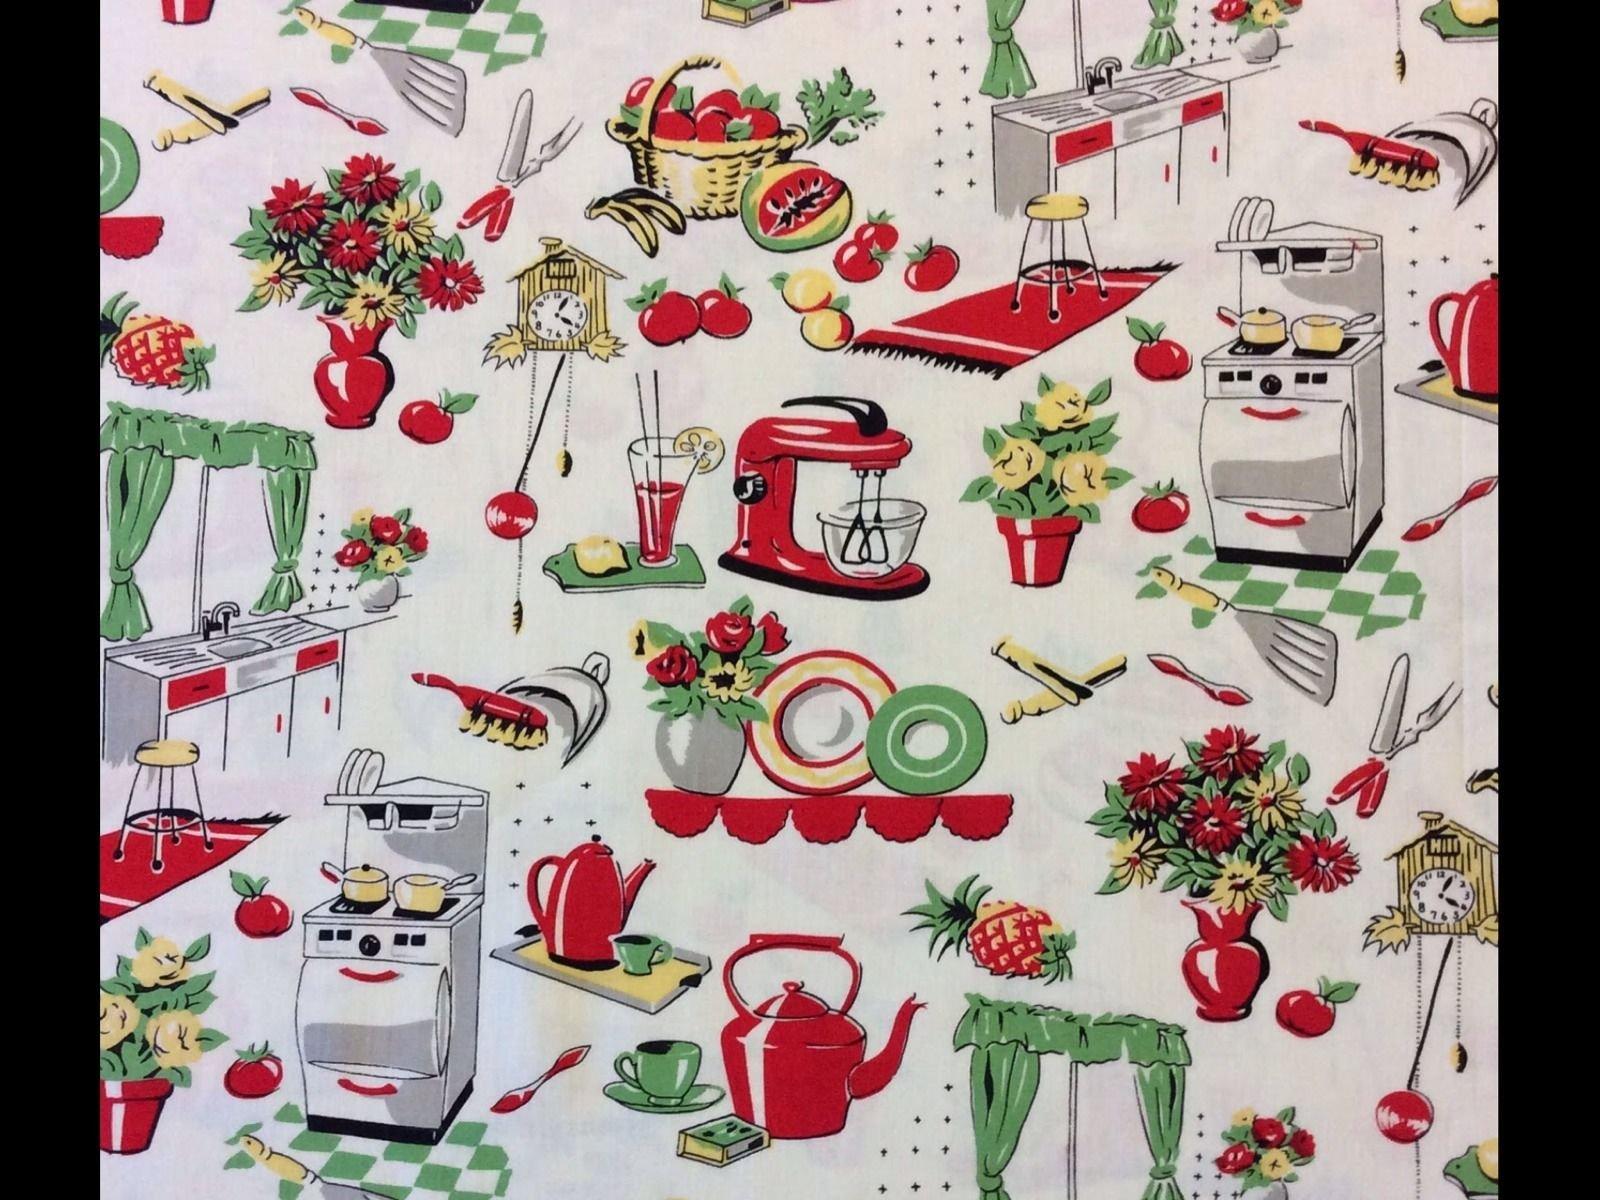 Retro Atomic Kitschy Kitchen Cooking Oven Mixer Cotton Quilt ...